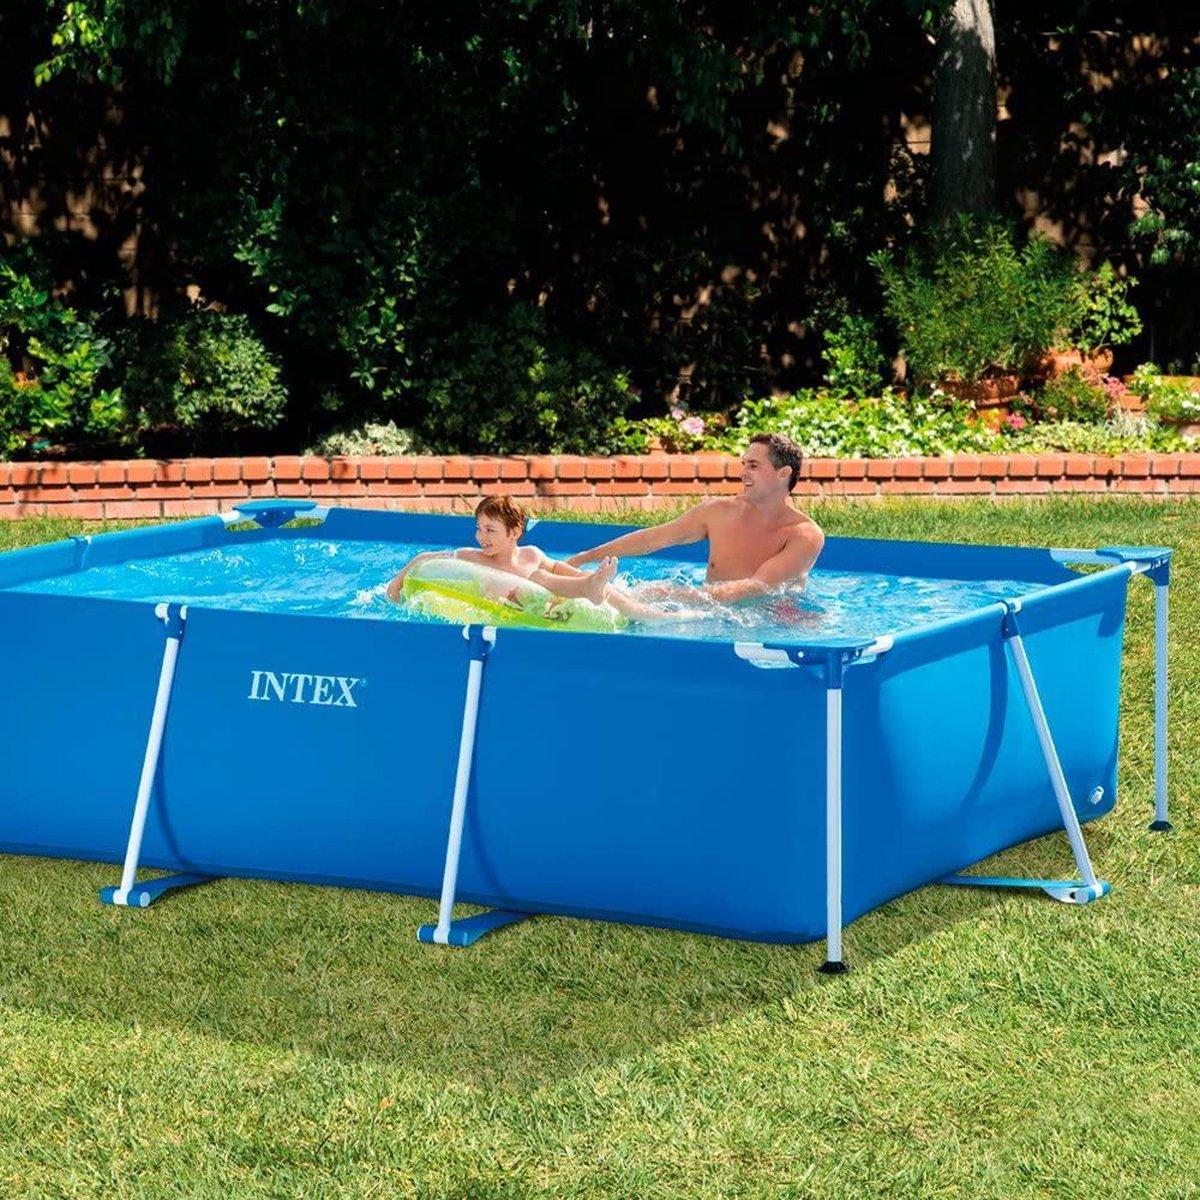 Intex Rectangular Frame Pool - bovengronds zwembad - 300 x 200 x 75 cm